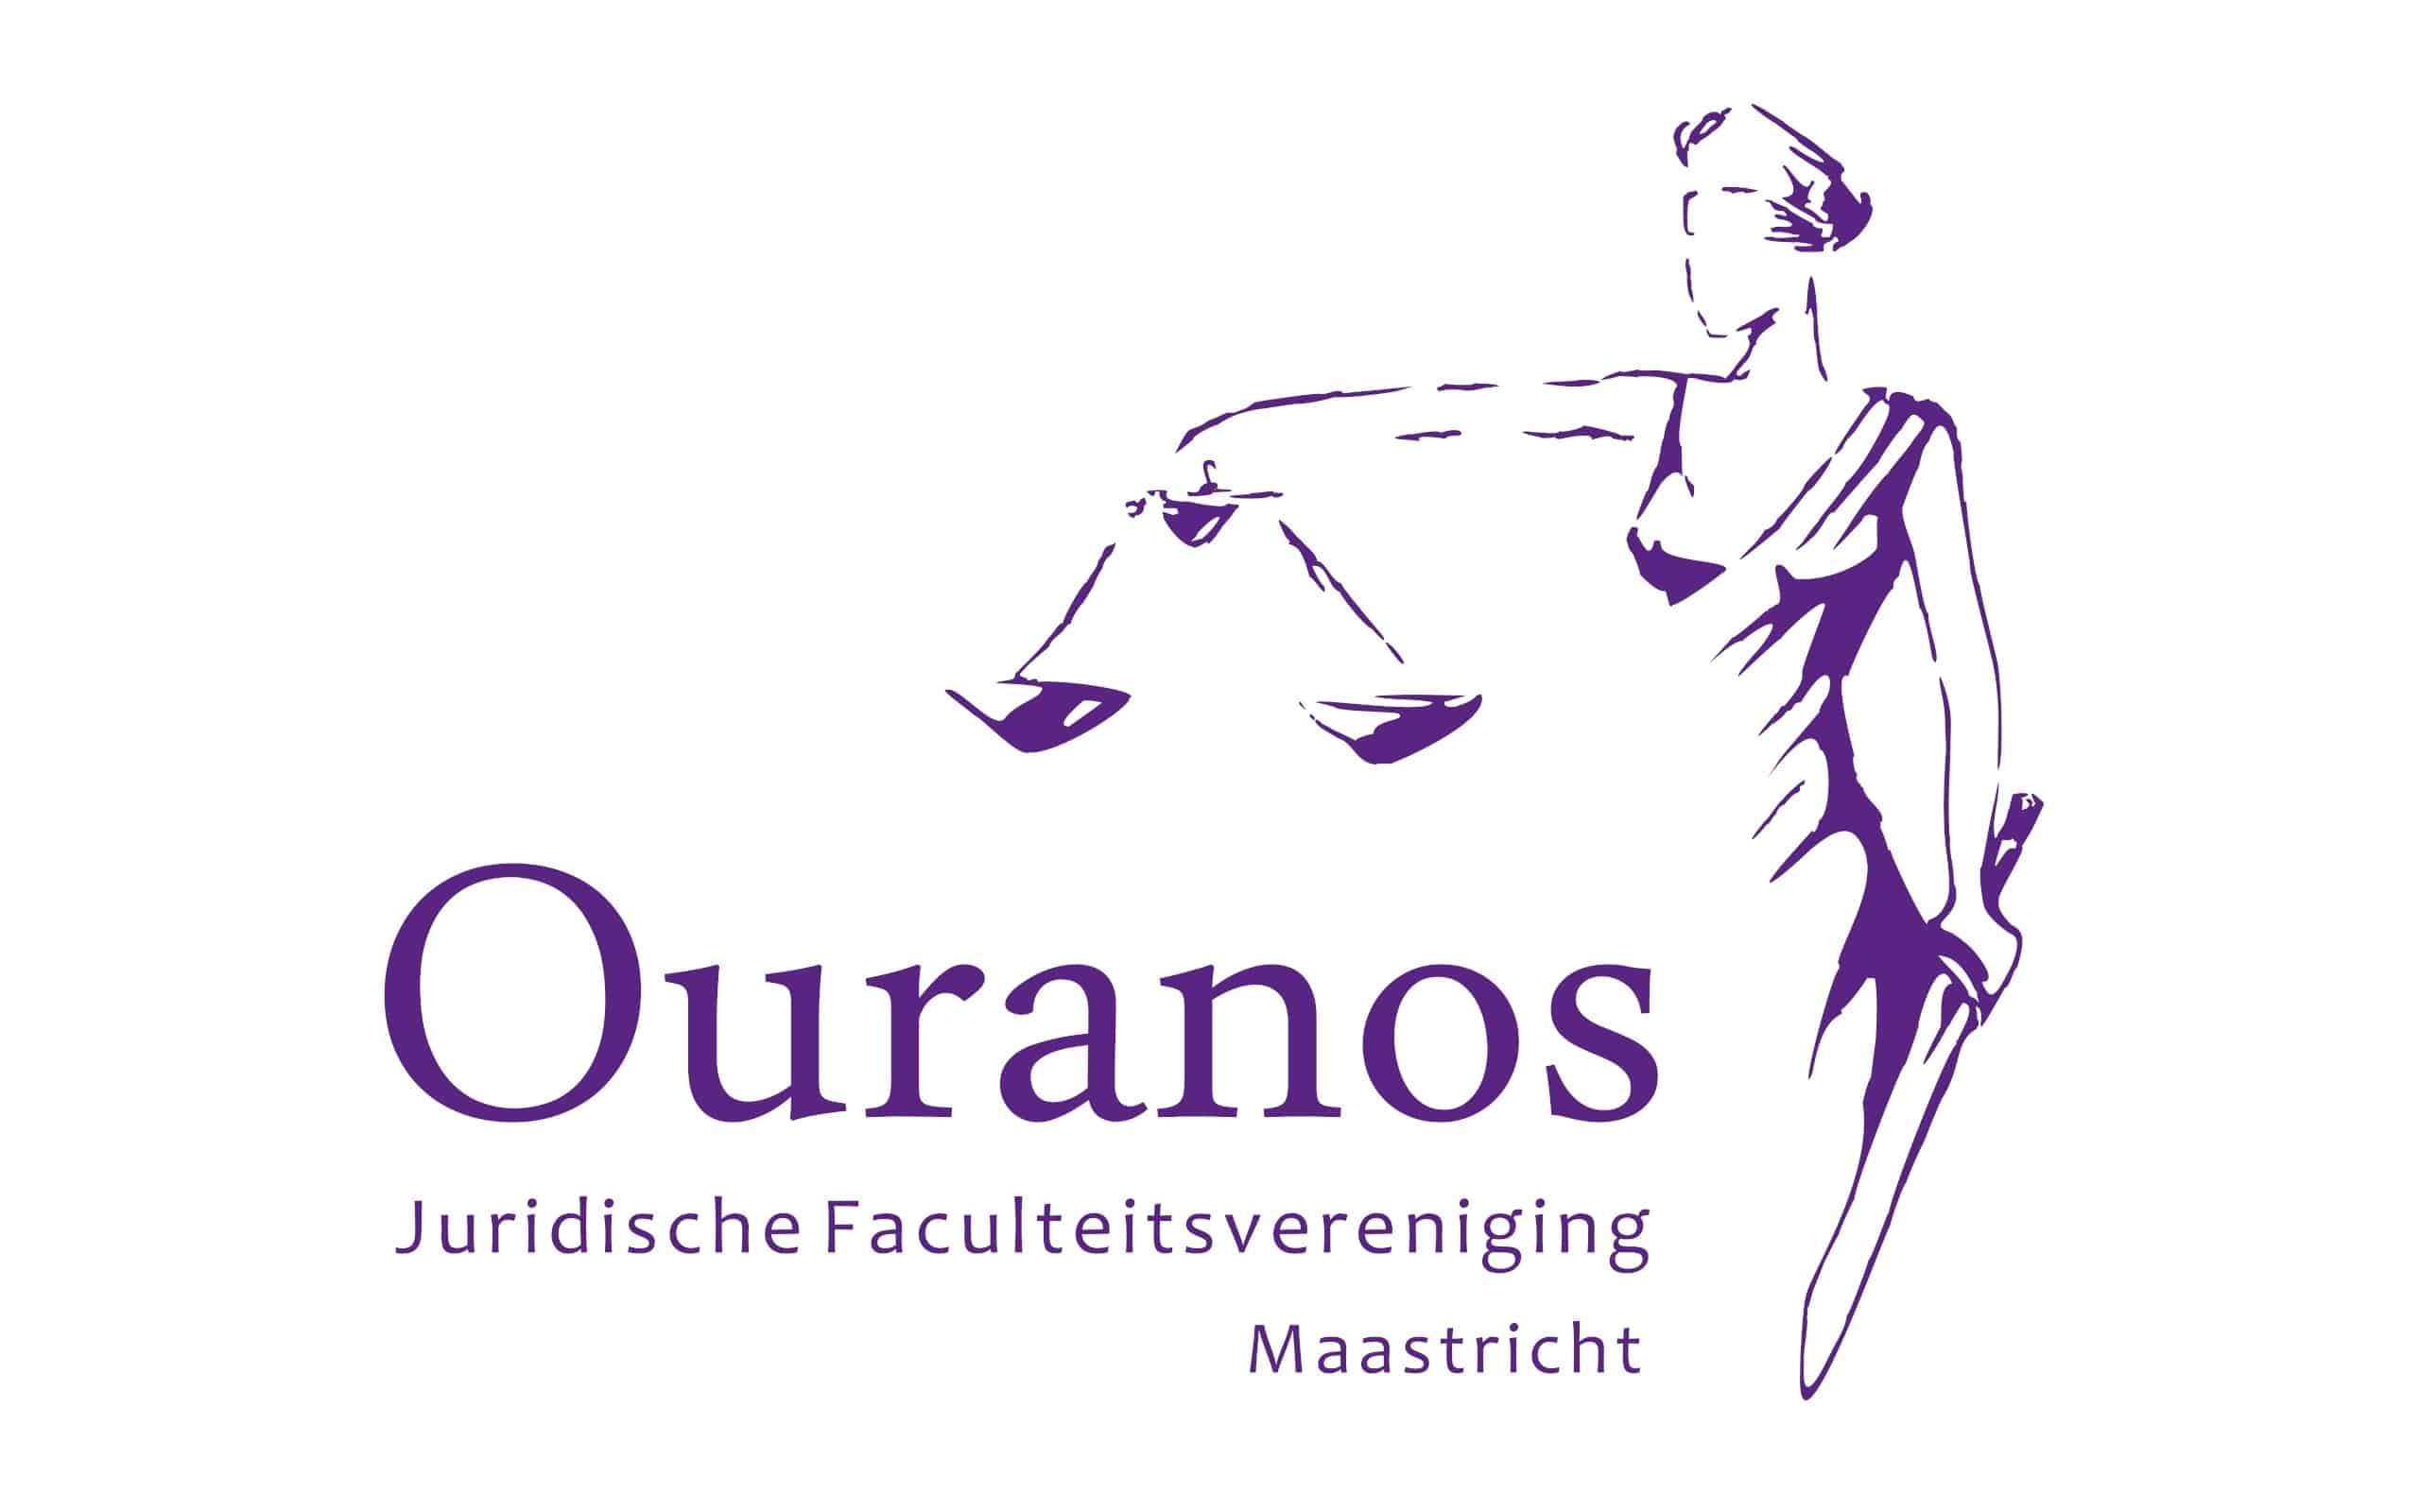 Juridische Faculteitsvereniging Ouranos